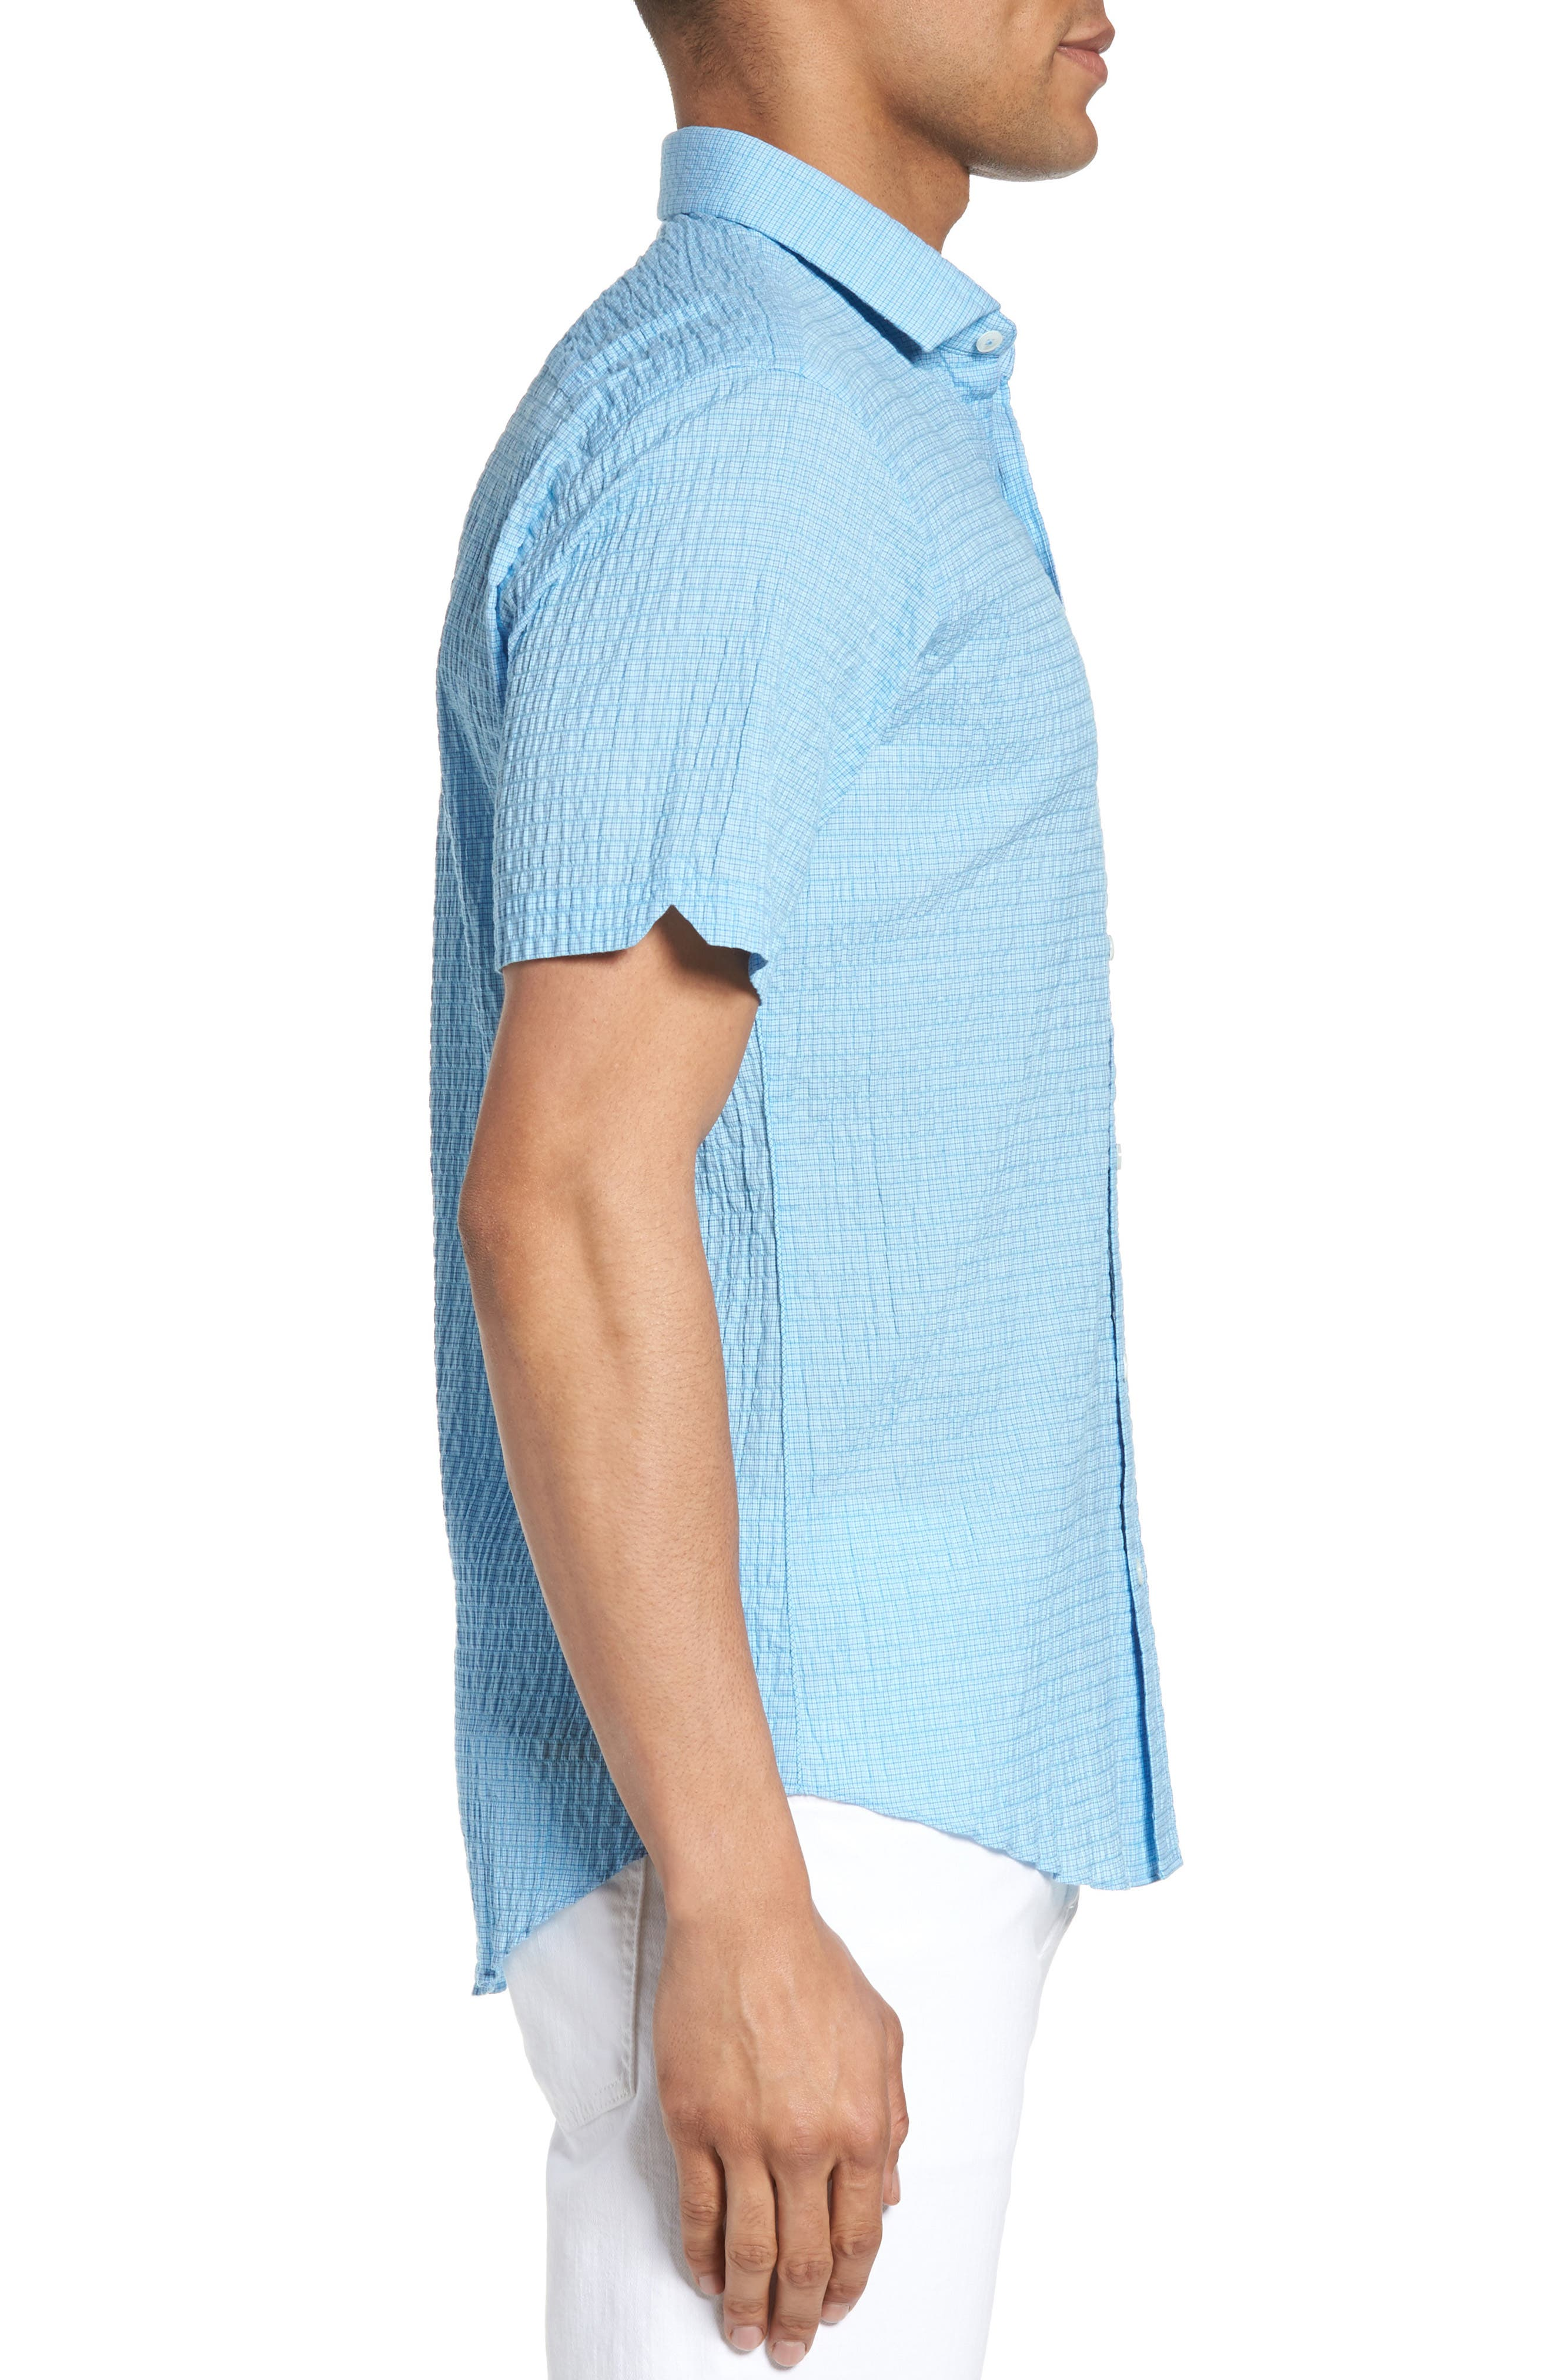 Morales Sport Shirt,                             Alternate thumbnail 3, color,                             439